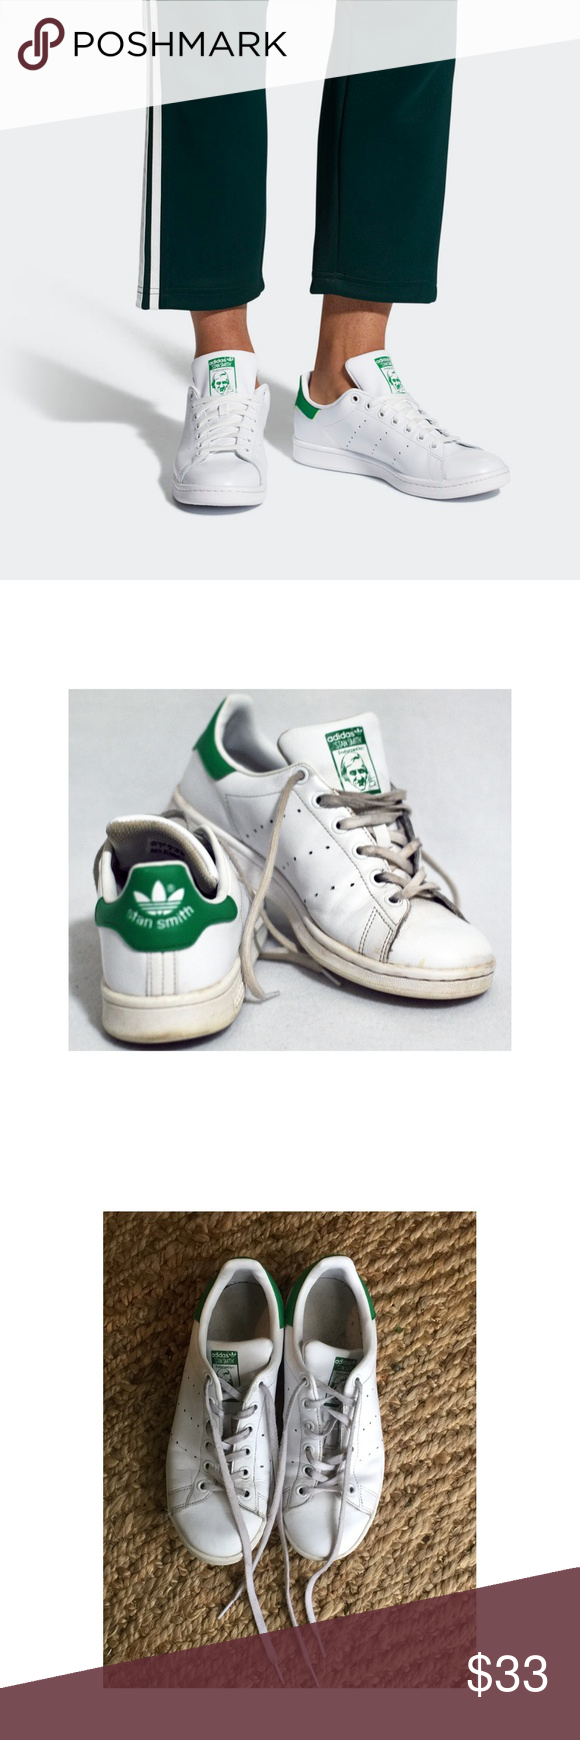 Adidas Stan Smith  mujer zapatos zapatillas adidas Stan Smith, Adidas